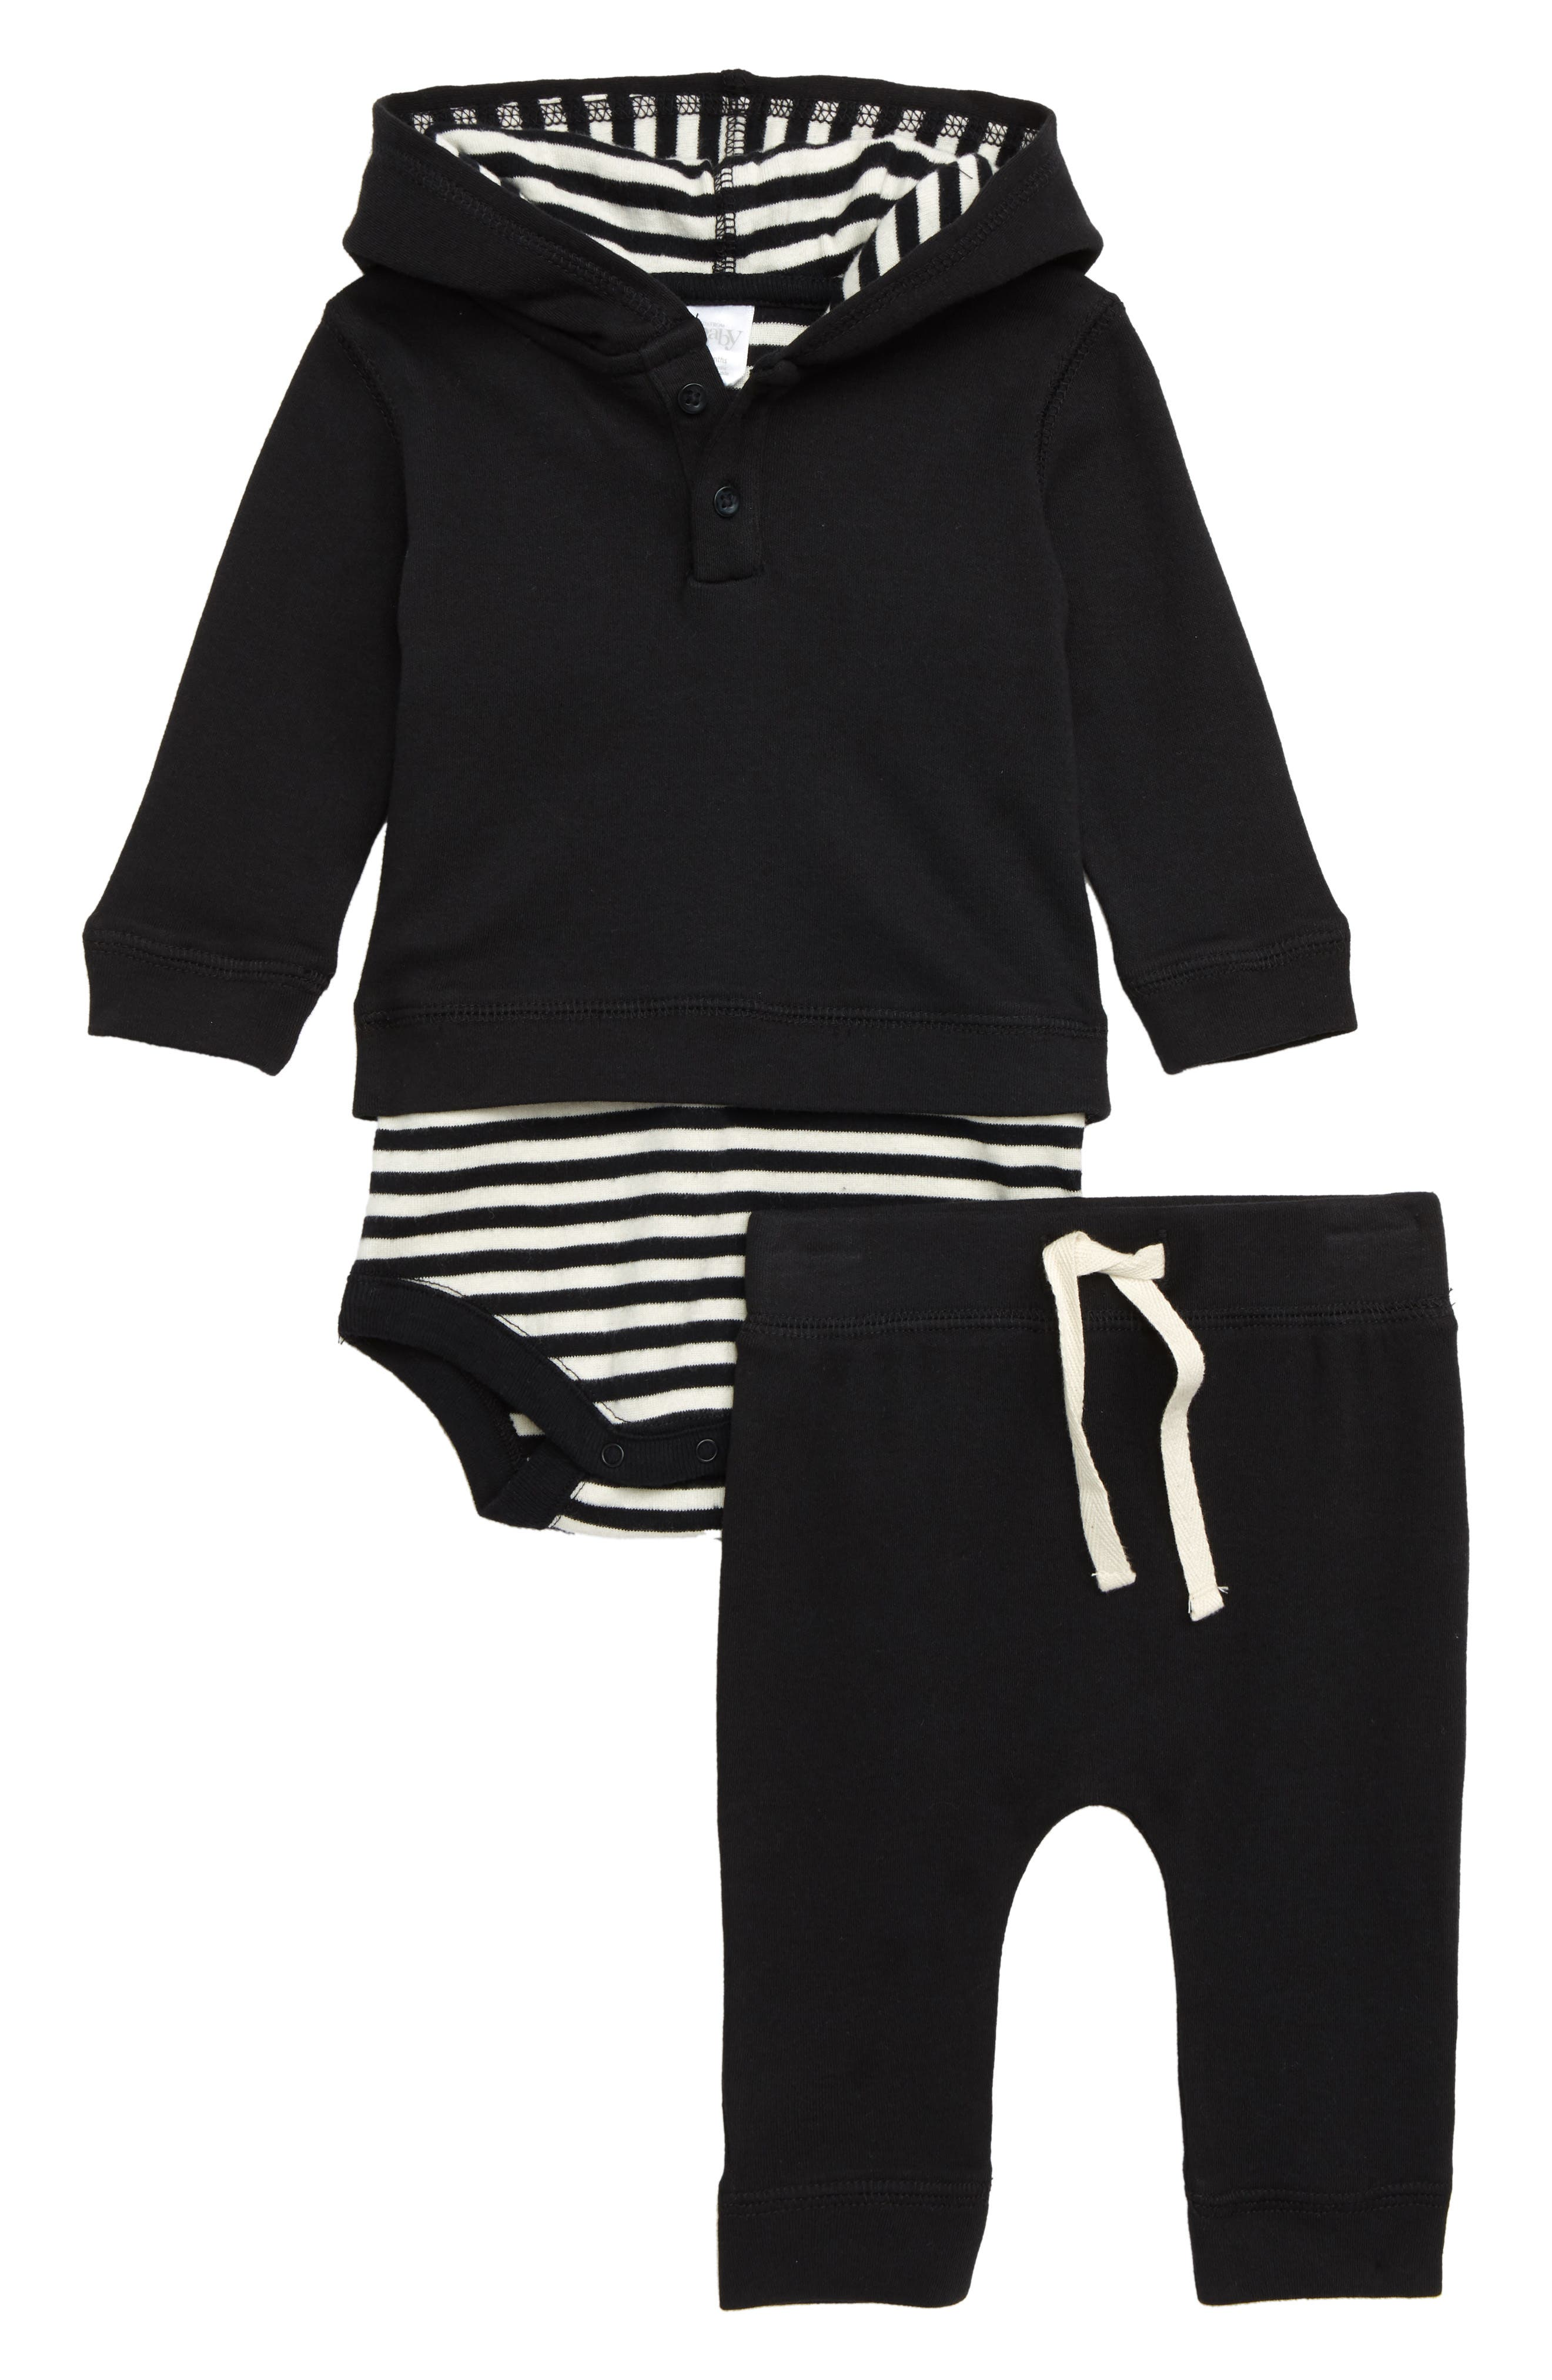 NORDSTROM BABY Hooded Bodysuit & Sweatpants Set, Main, color, 001